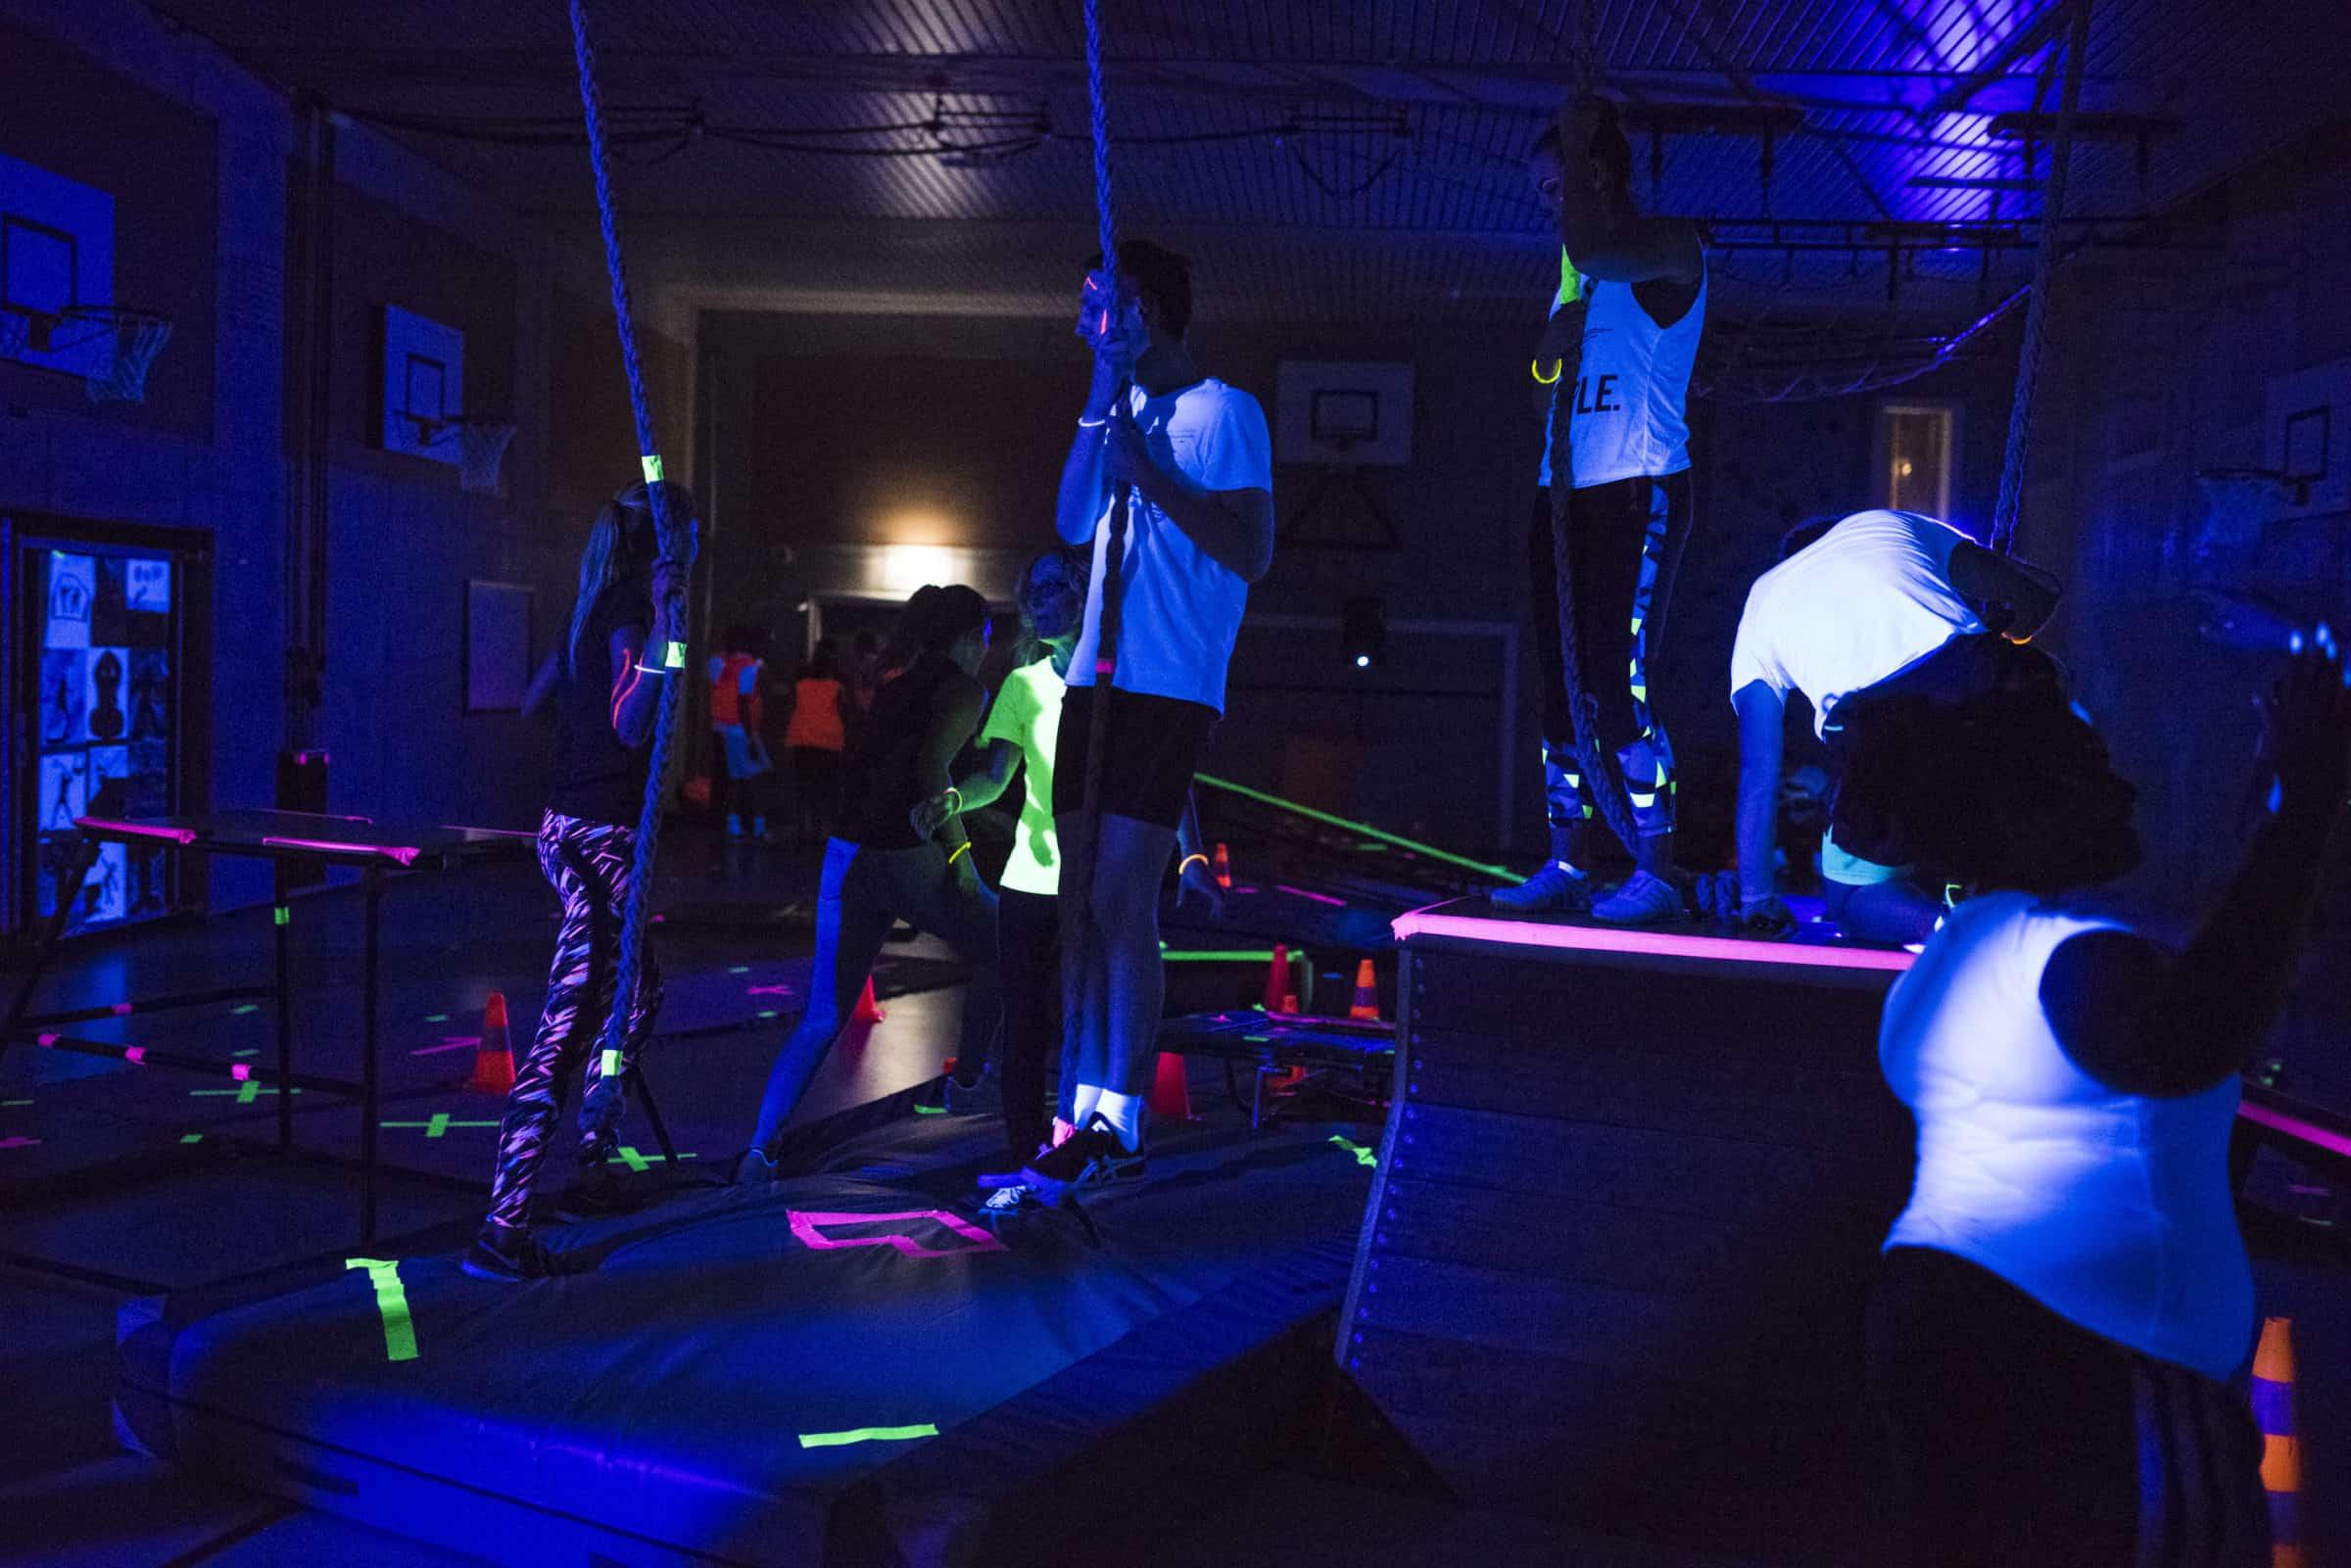 APENKOOI_1 - sportief, gym, kind, spelletjes, blacklight